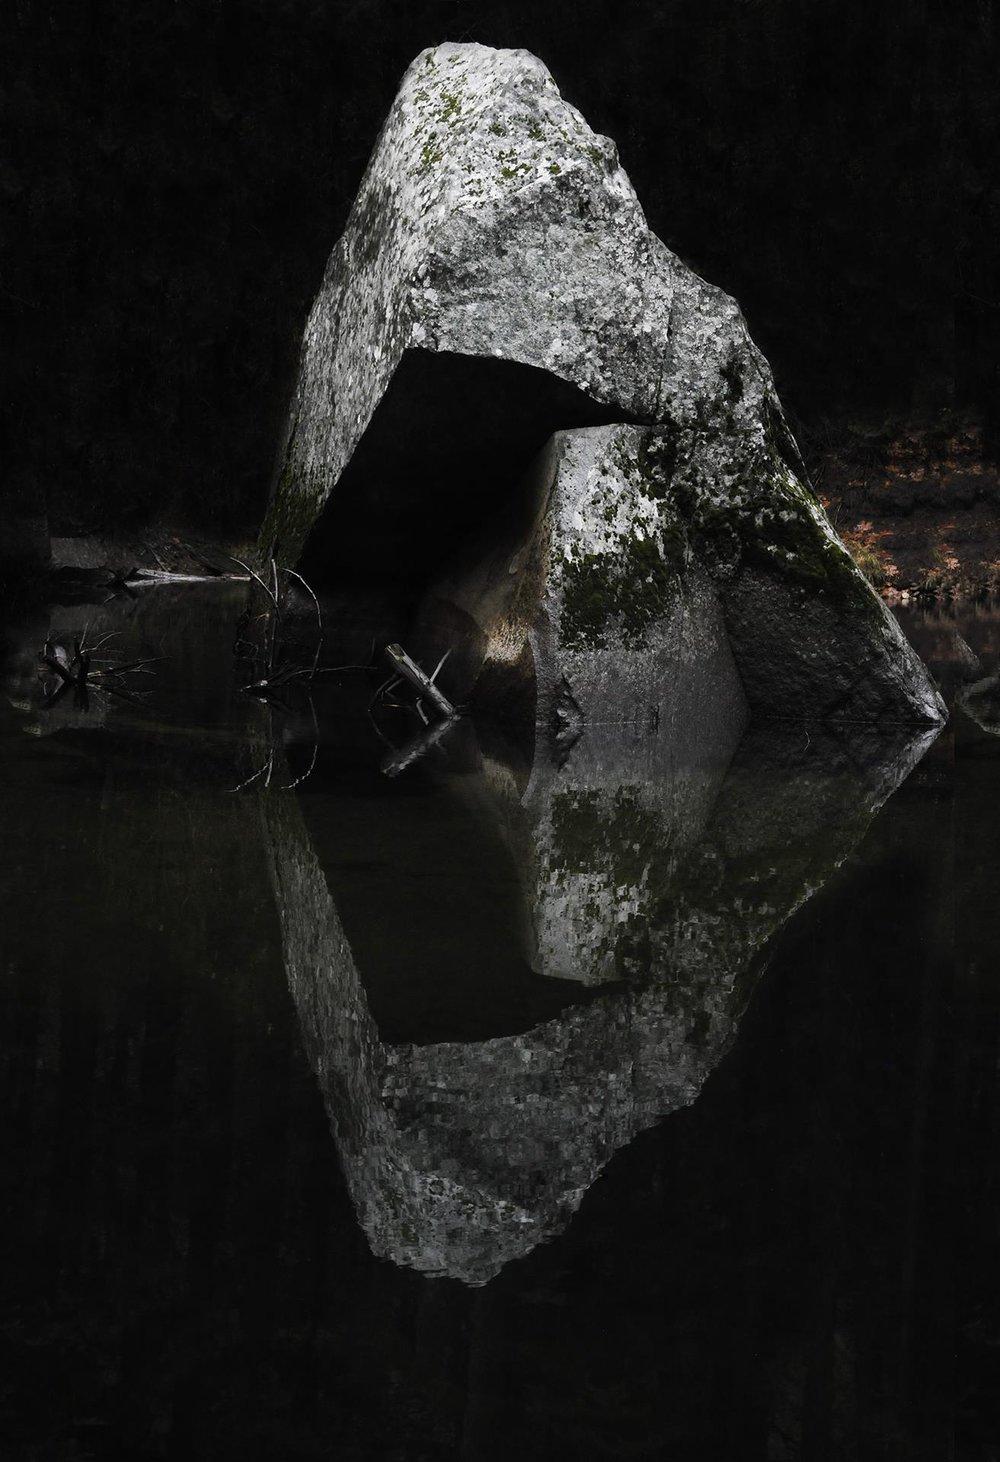 8689-merced_river-1011201619-39357.jpg